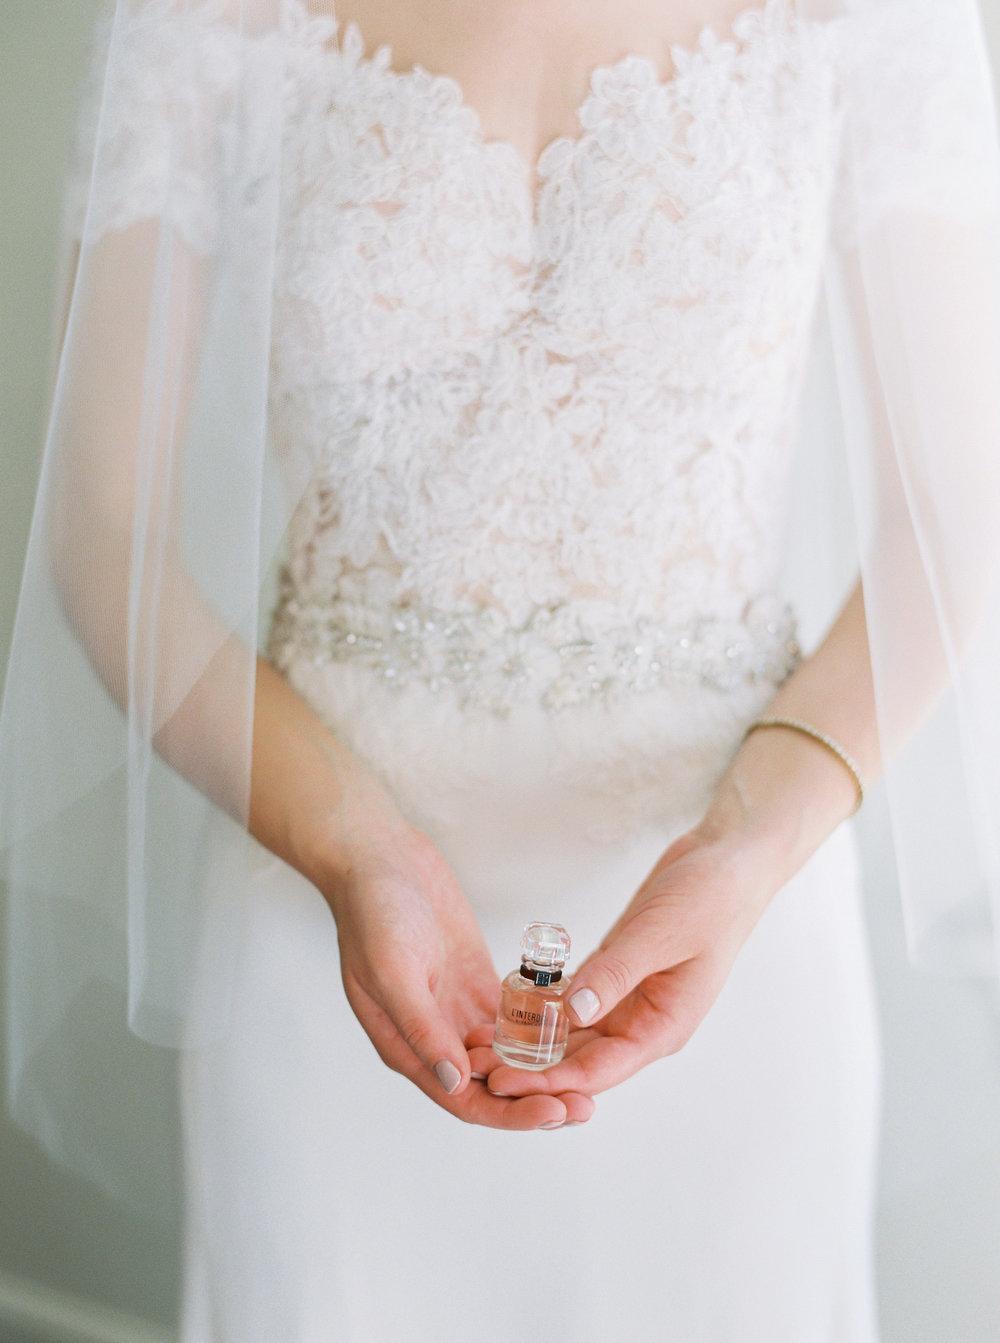 Log-cabin-wedding-in-presidio-san-francisco-california-desintation-wedding-photography-27.jpg